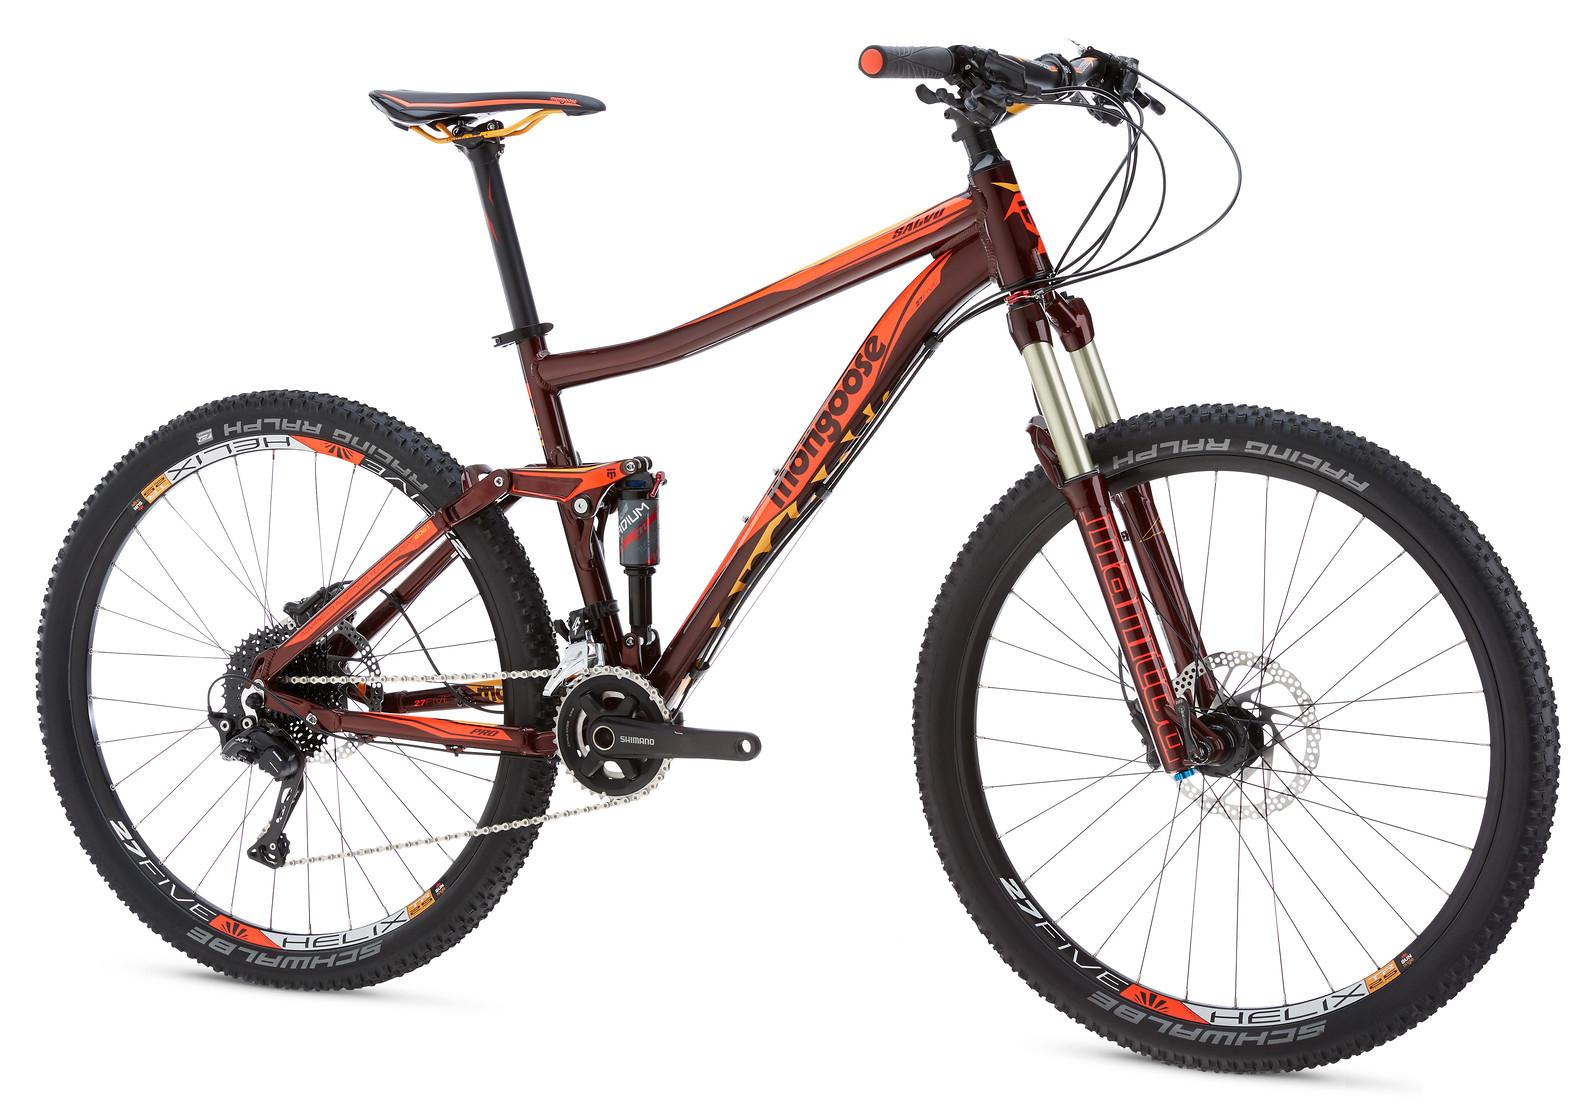 mongoose mountain bike prices - HD1596×1112